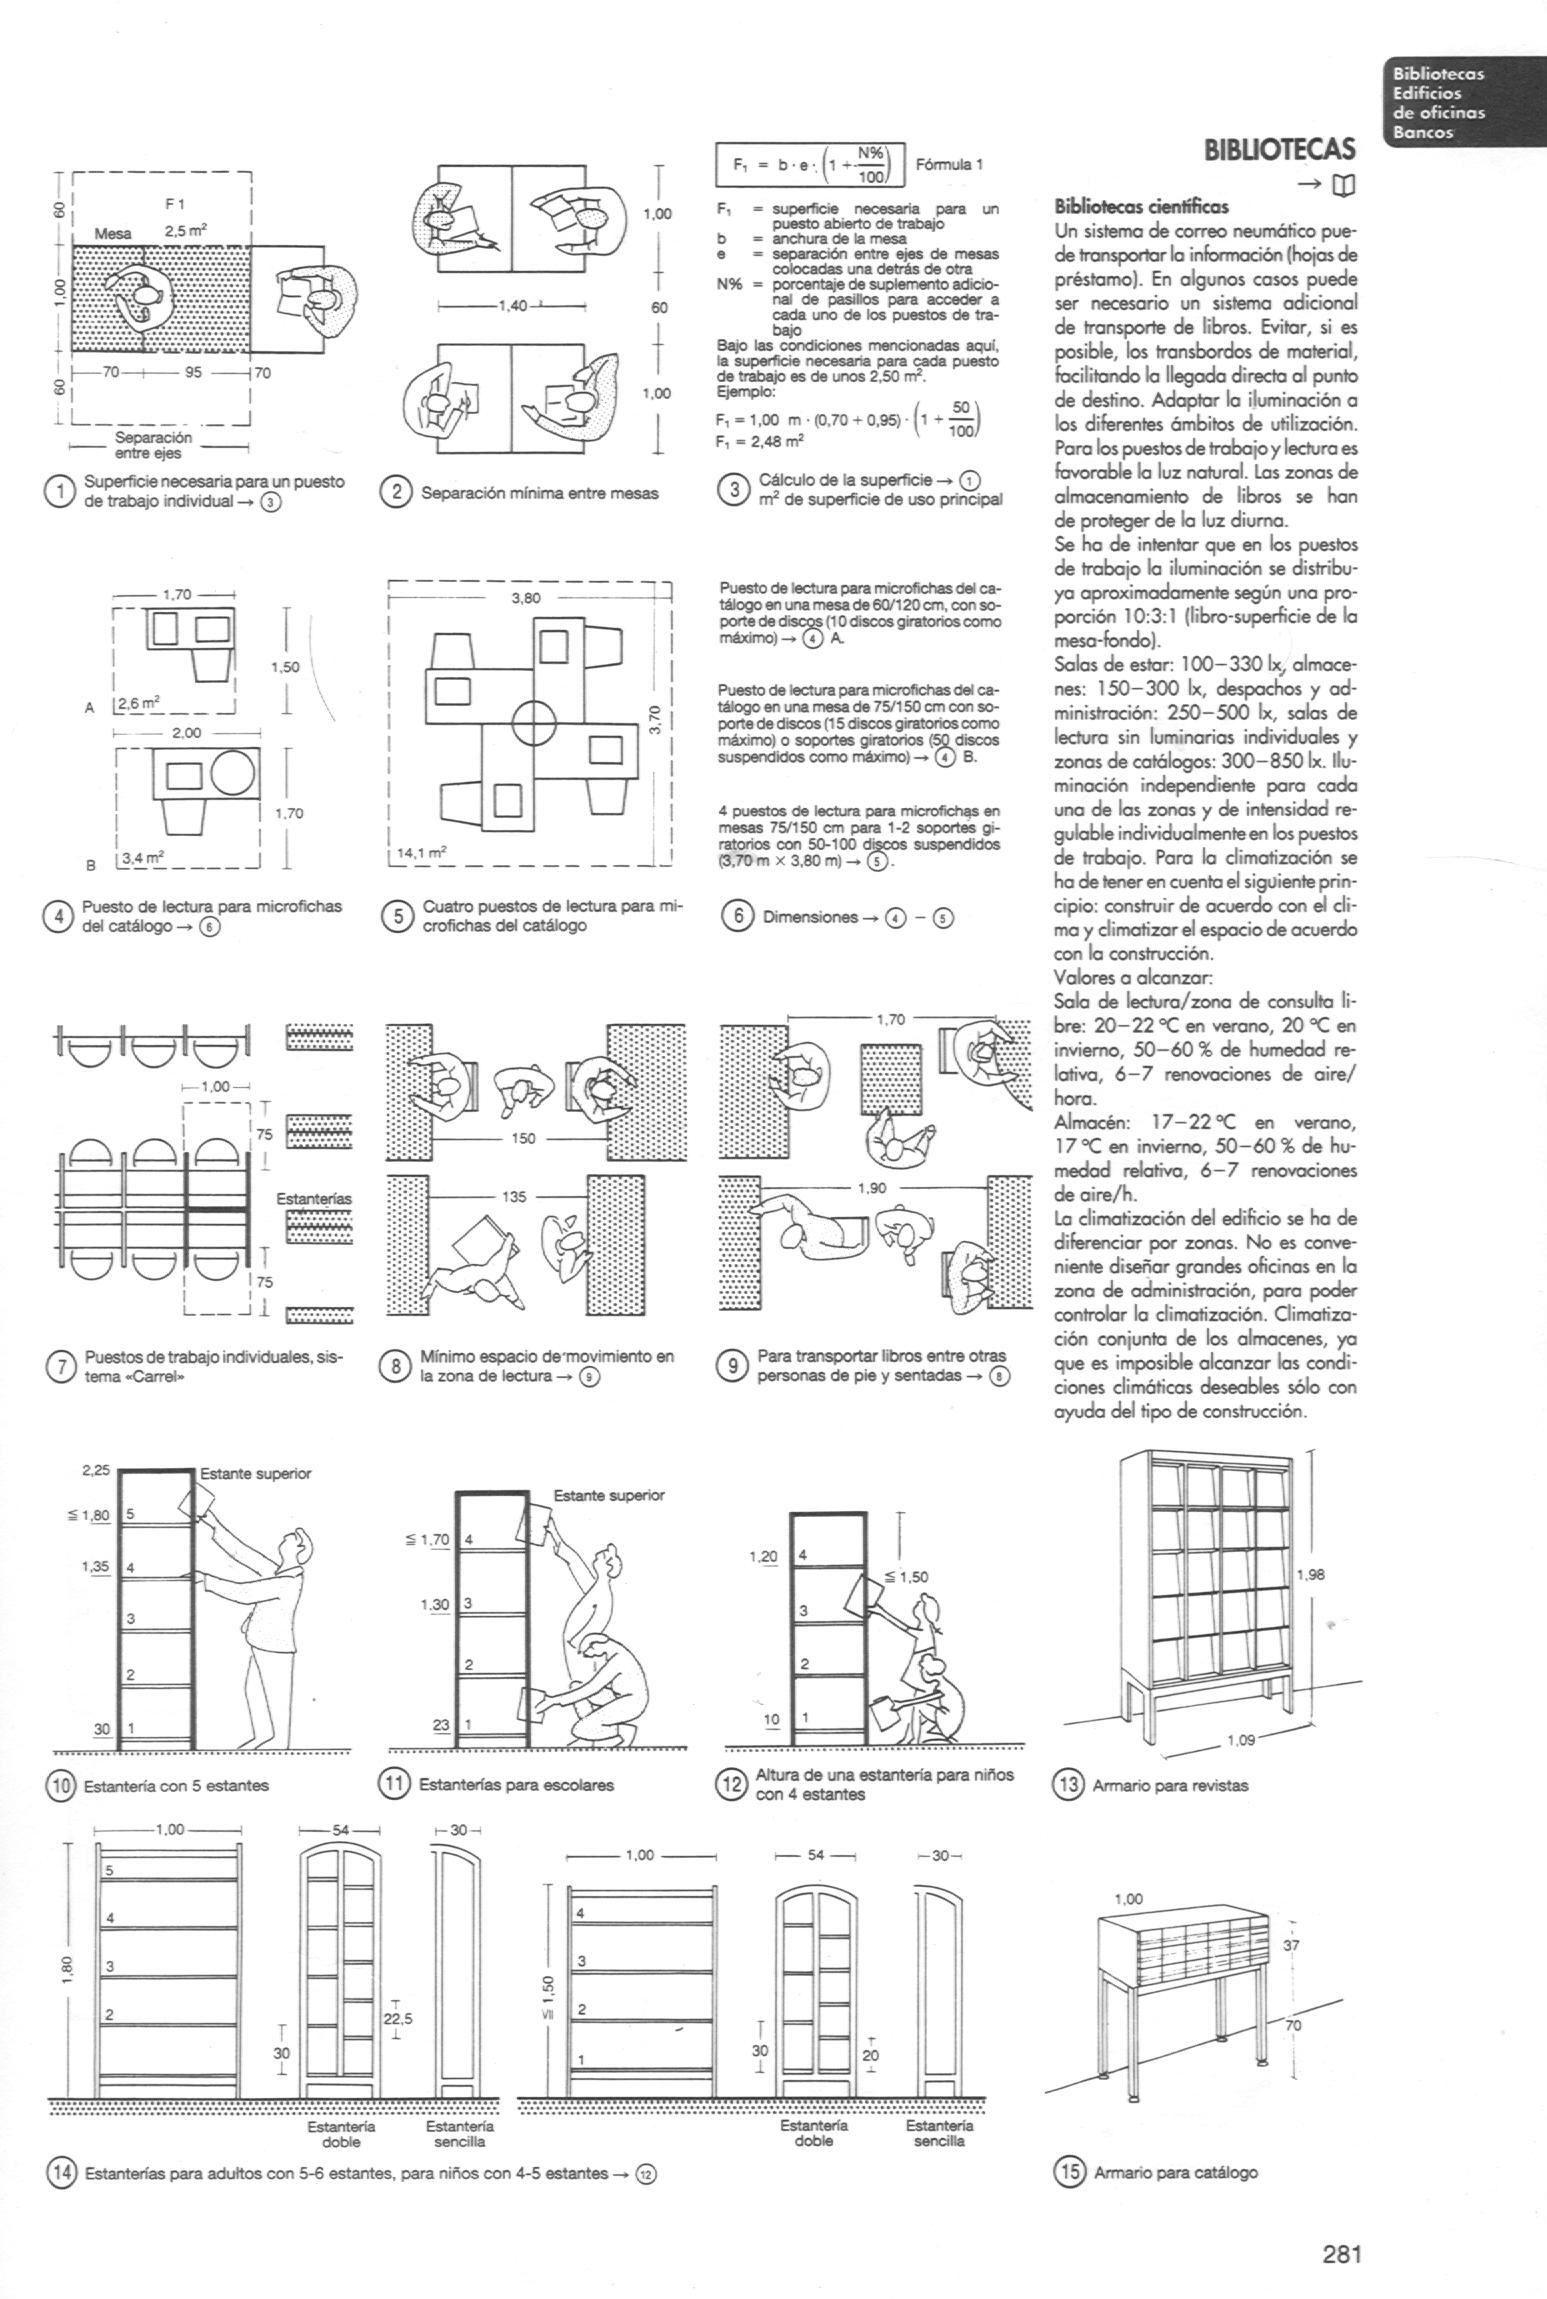 Architecture ebook arte de proyectar en arquitectura gg